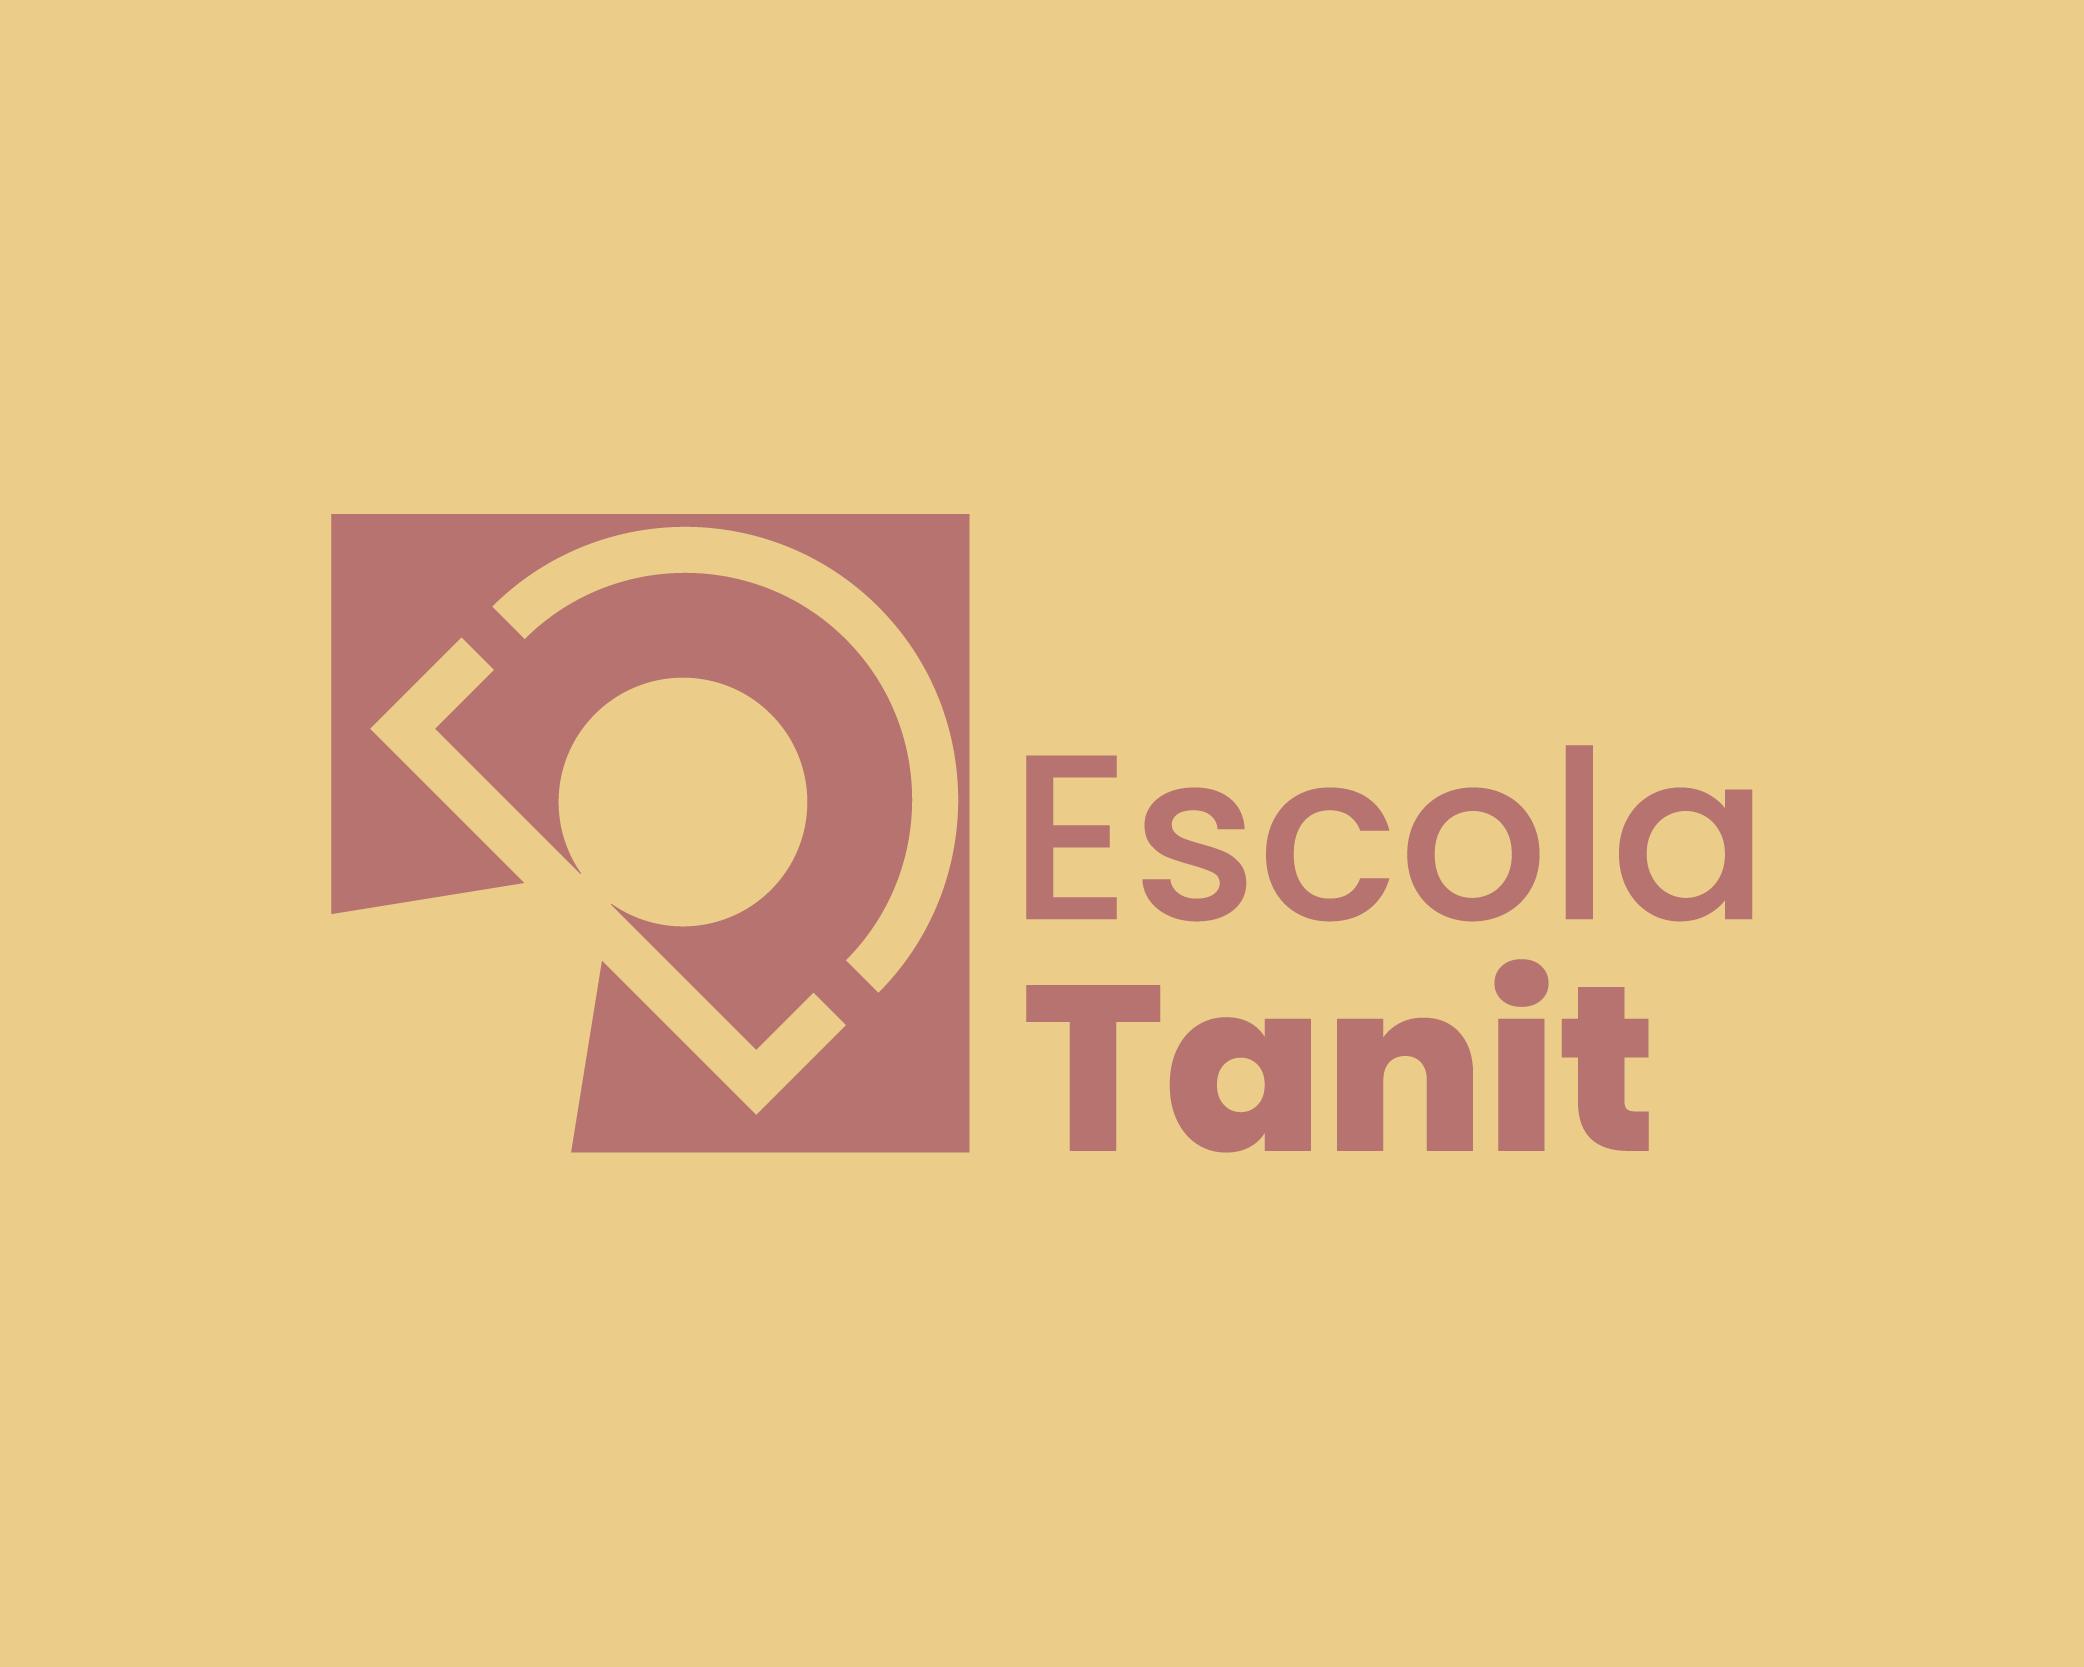 Escola Tanit